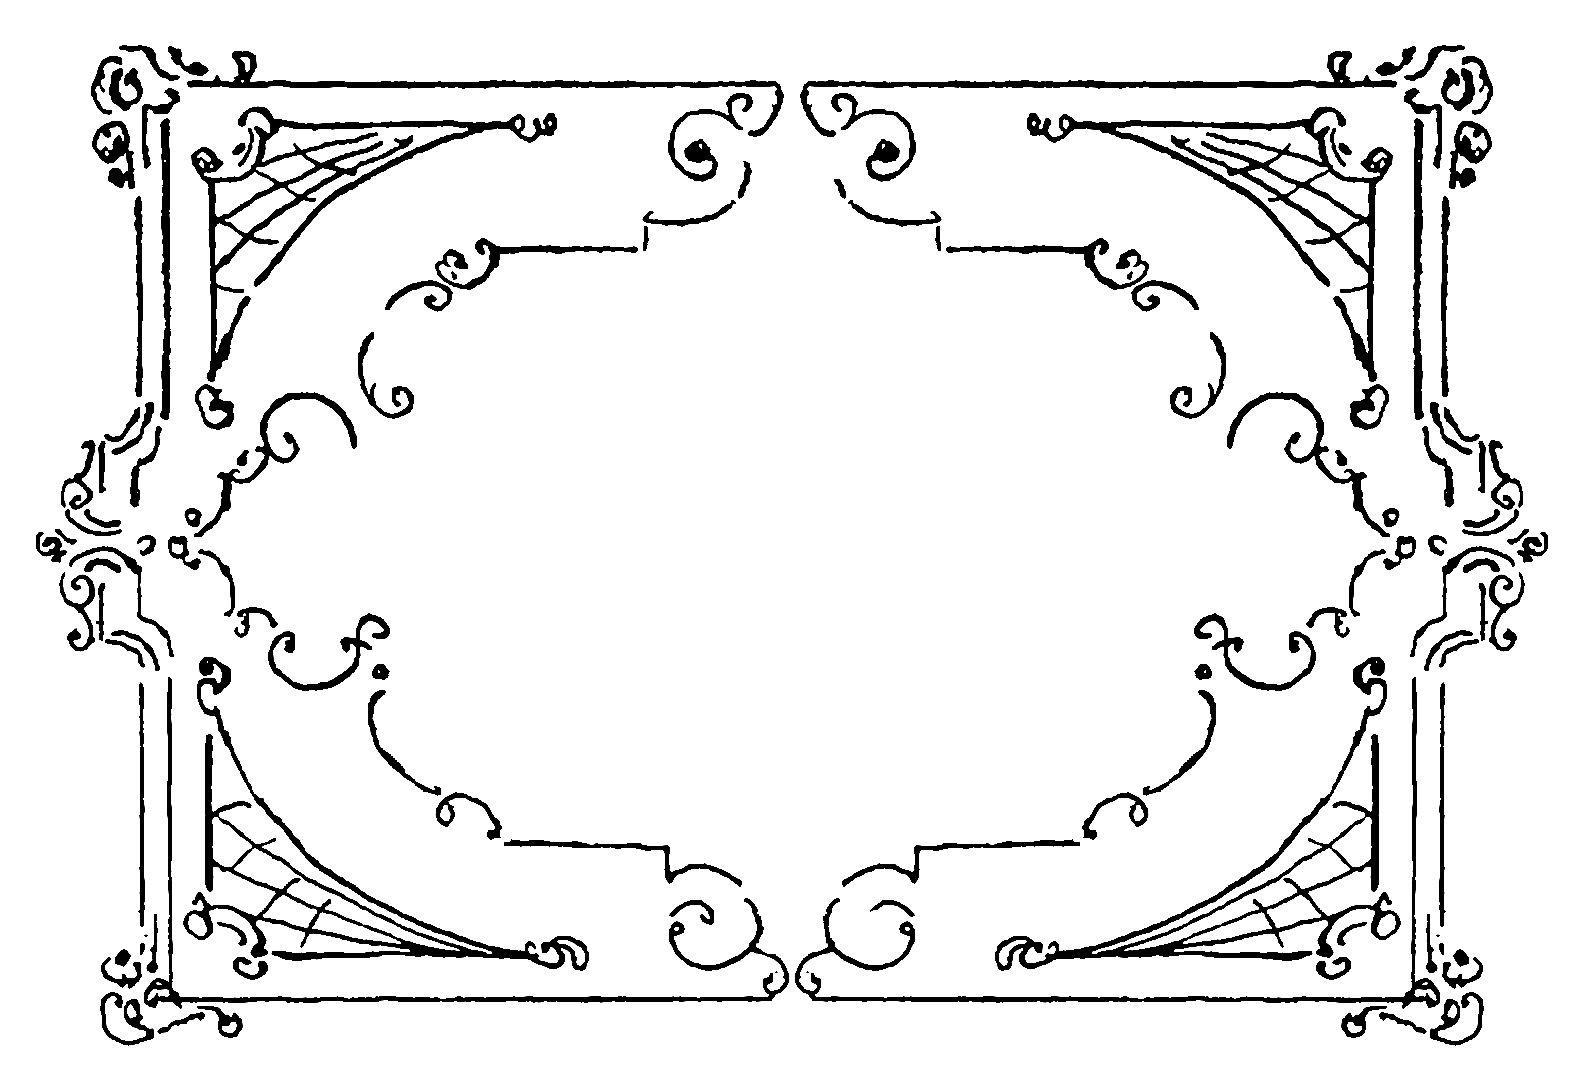 Digital Stamp Design Free Printable Flourish Frame Swirl